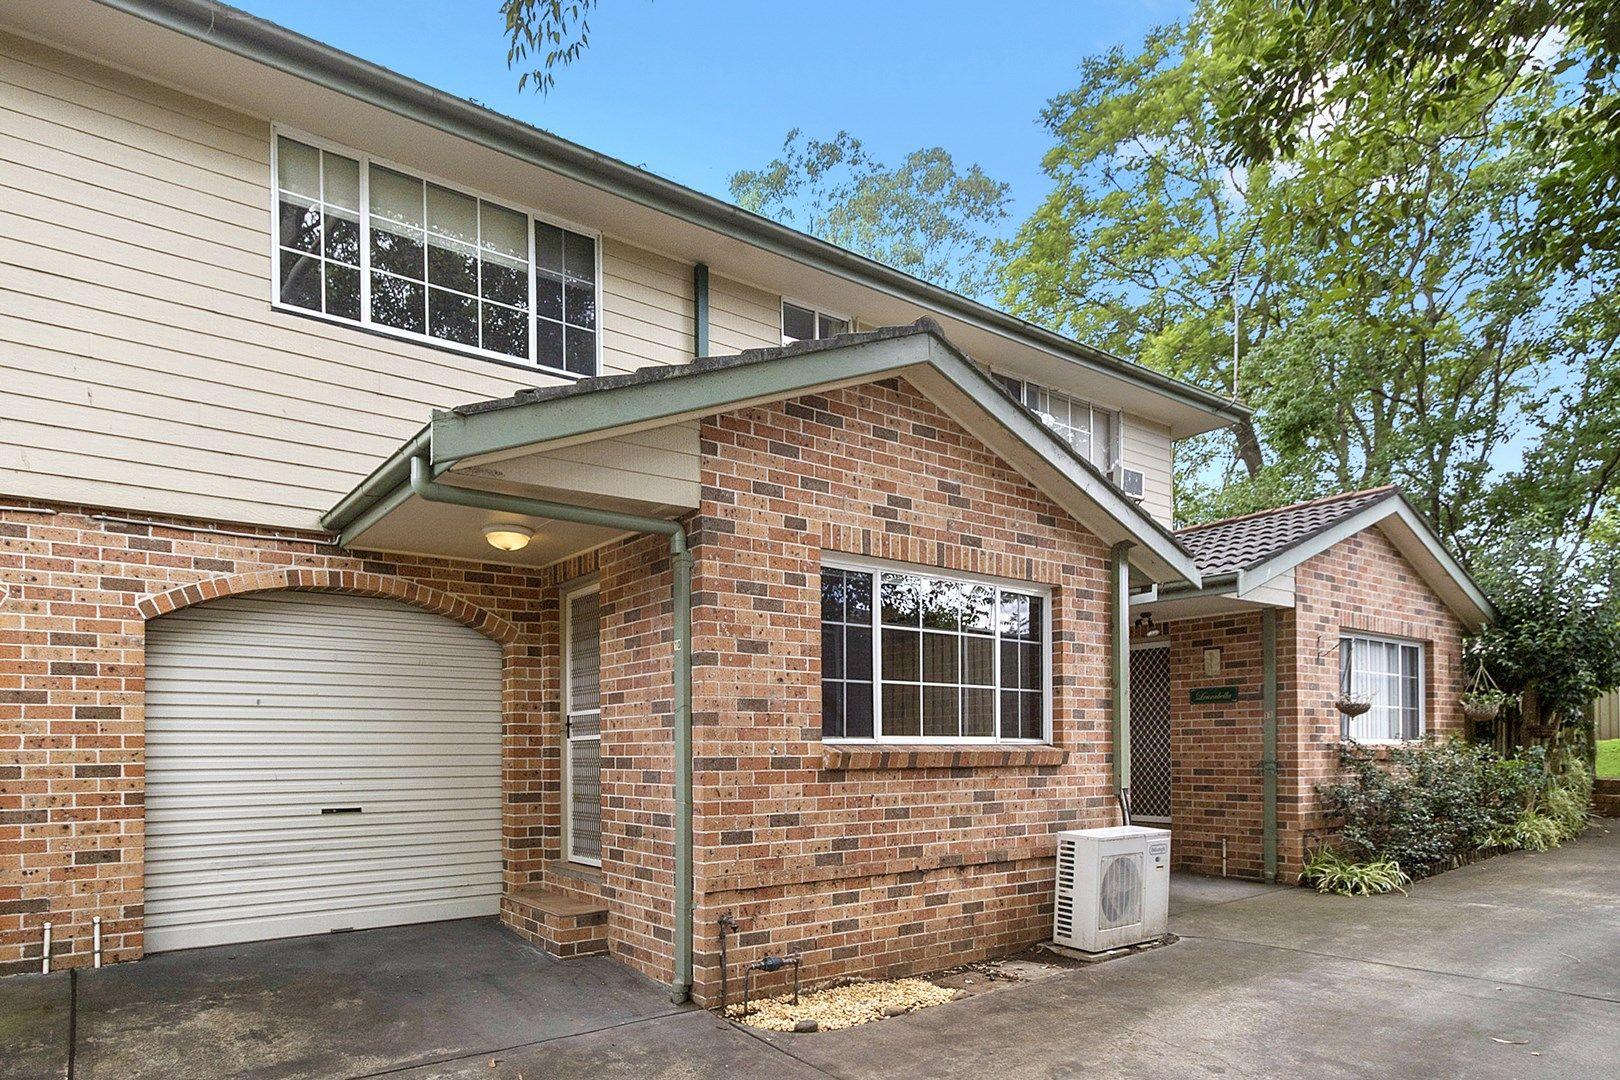 10/66 William Street, North Richmond NSW 2754, Image 0